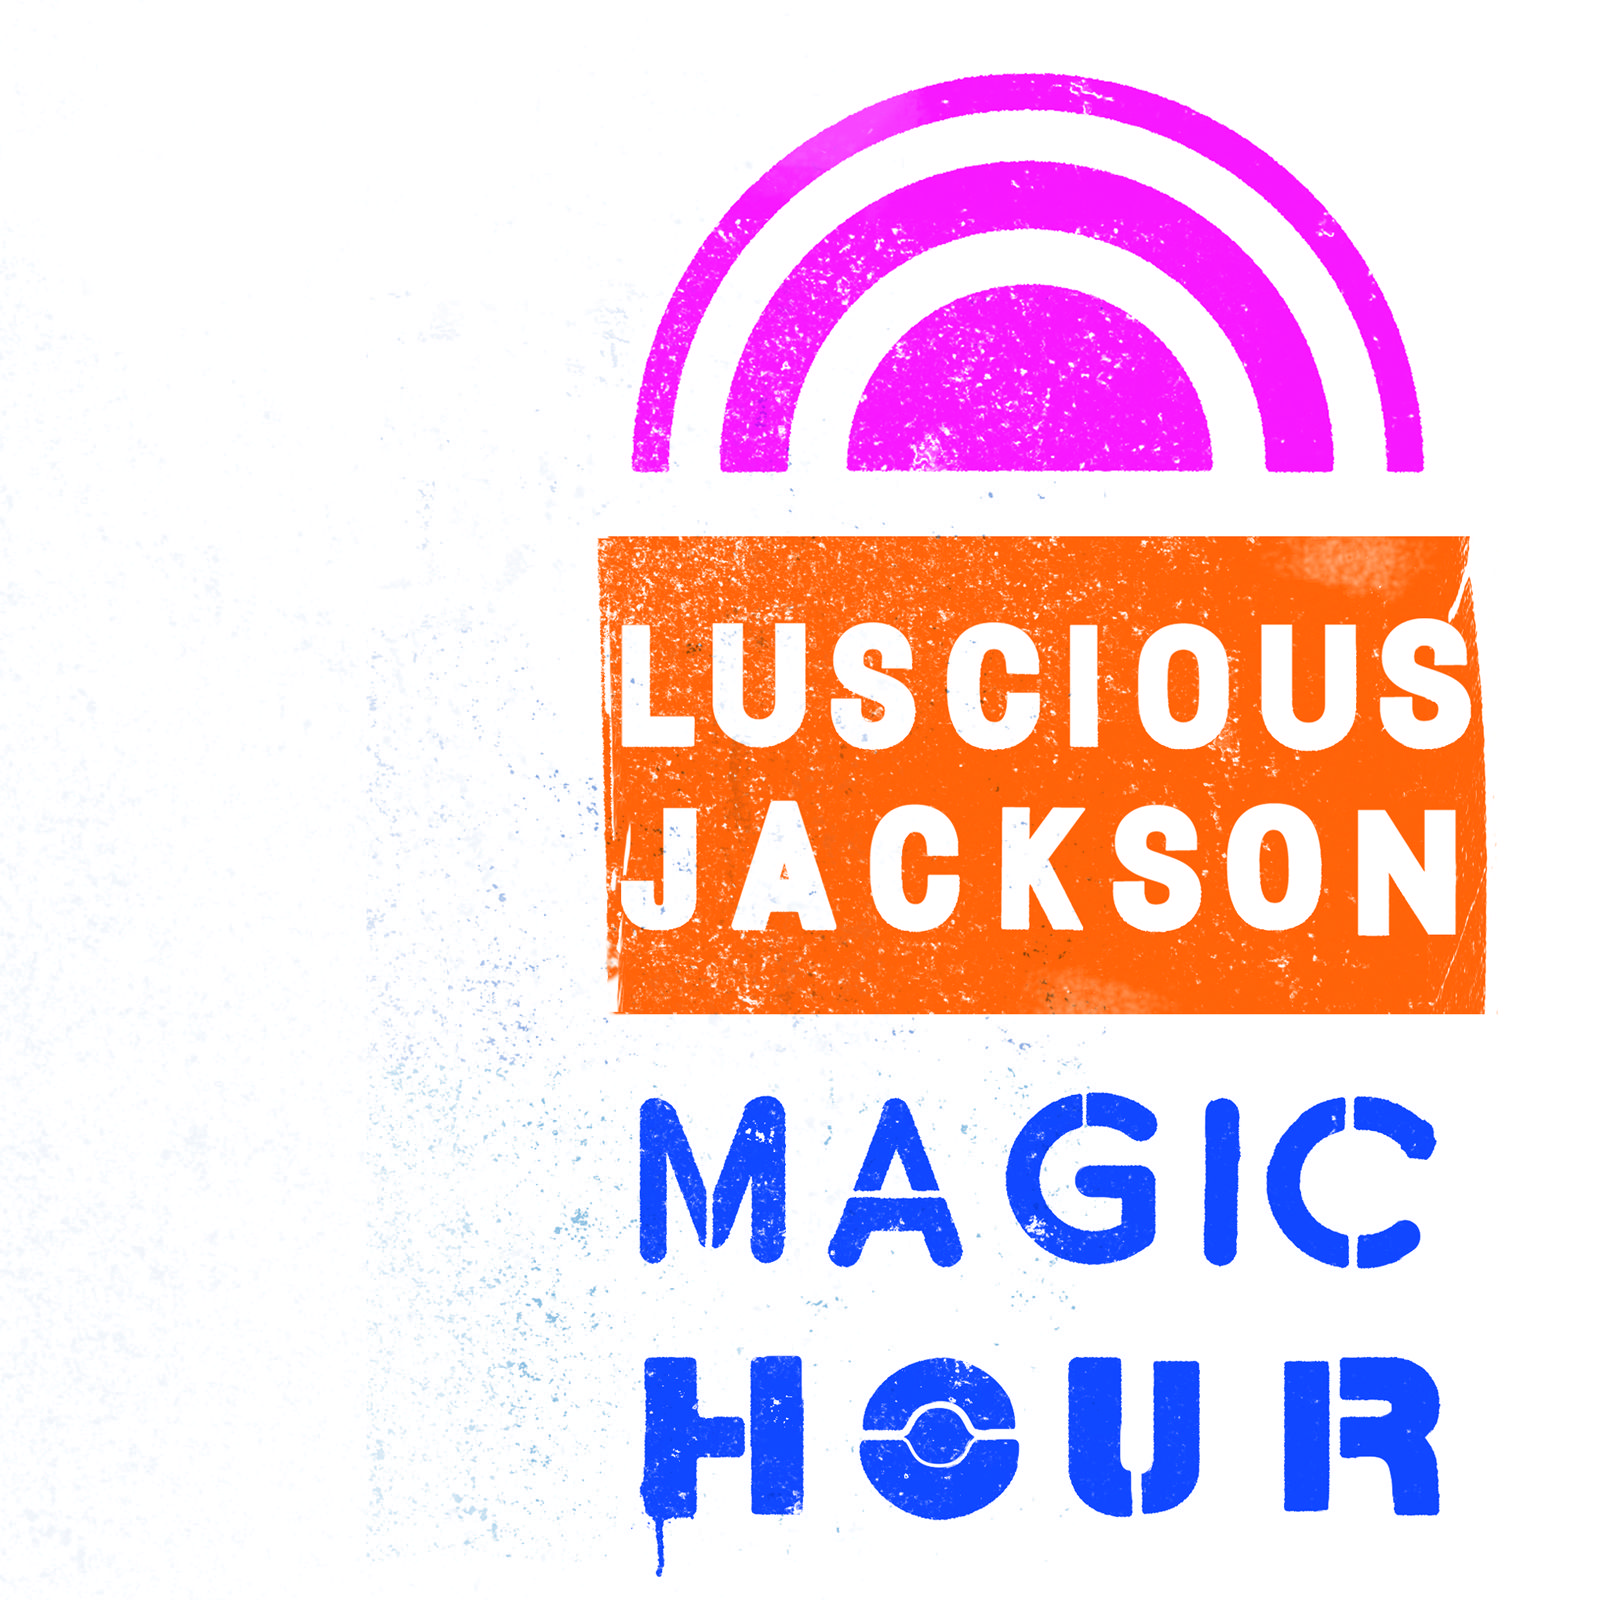 Luscious Jackson Magic Hour